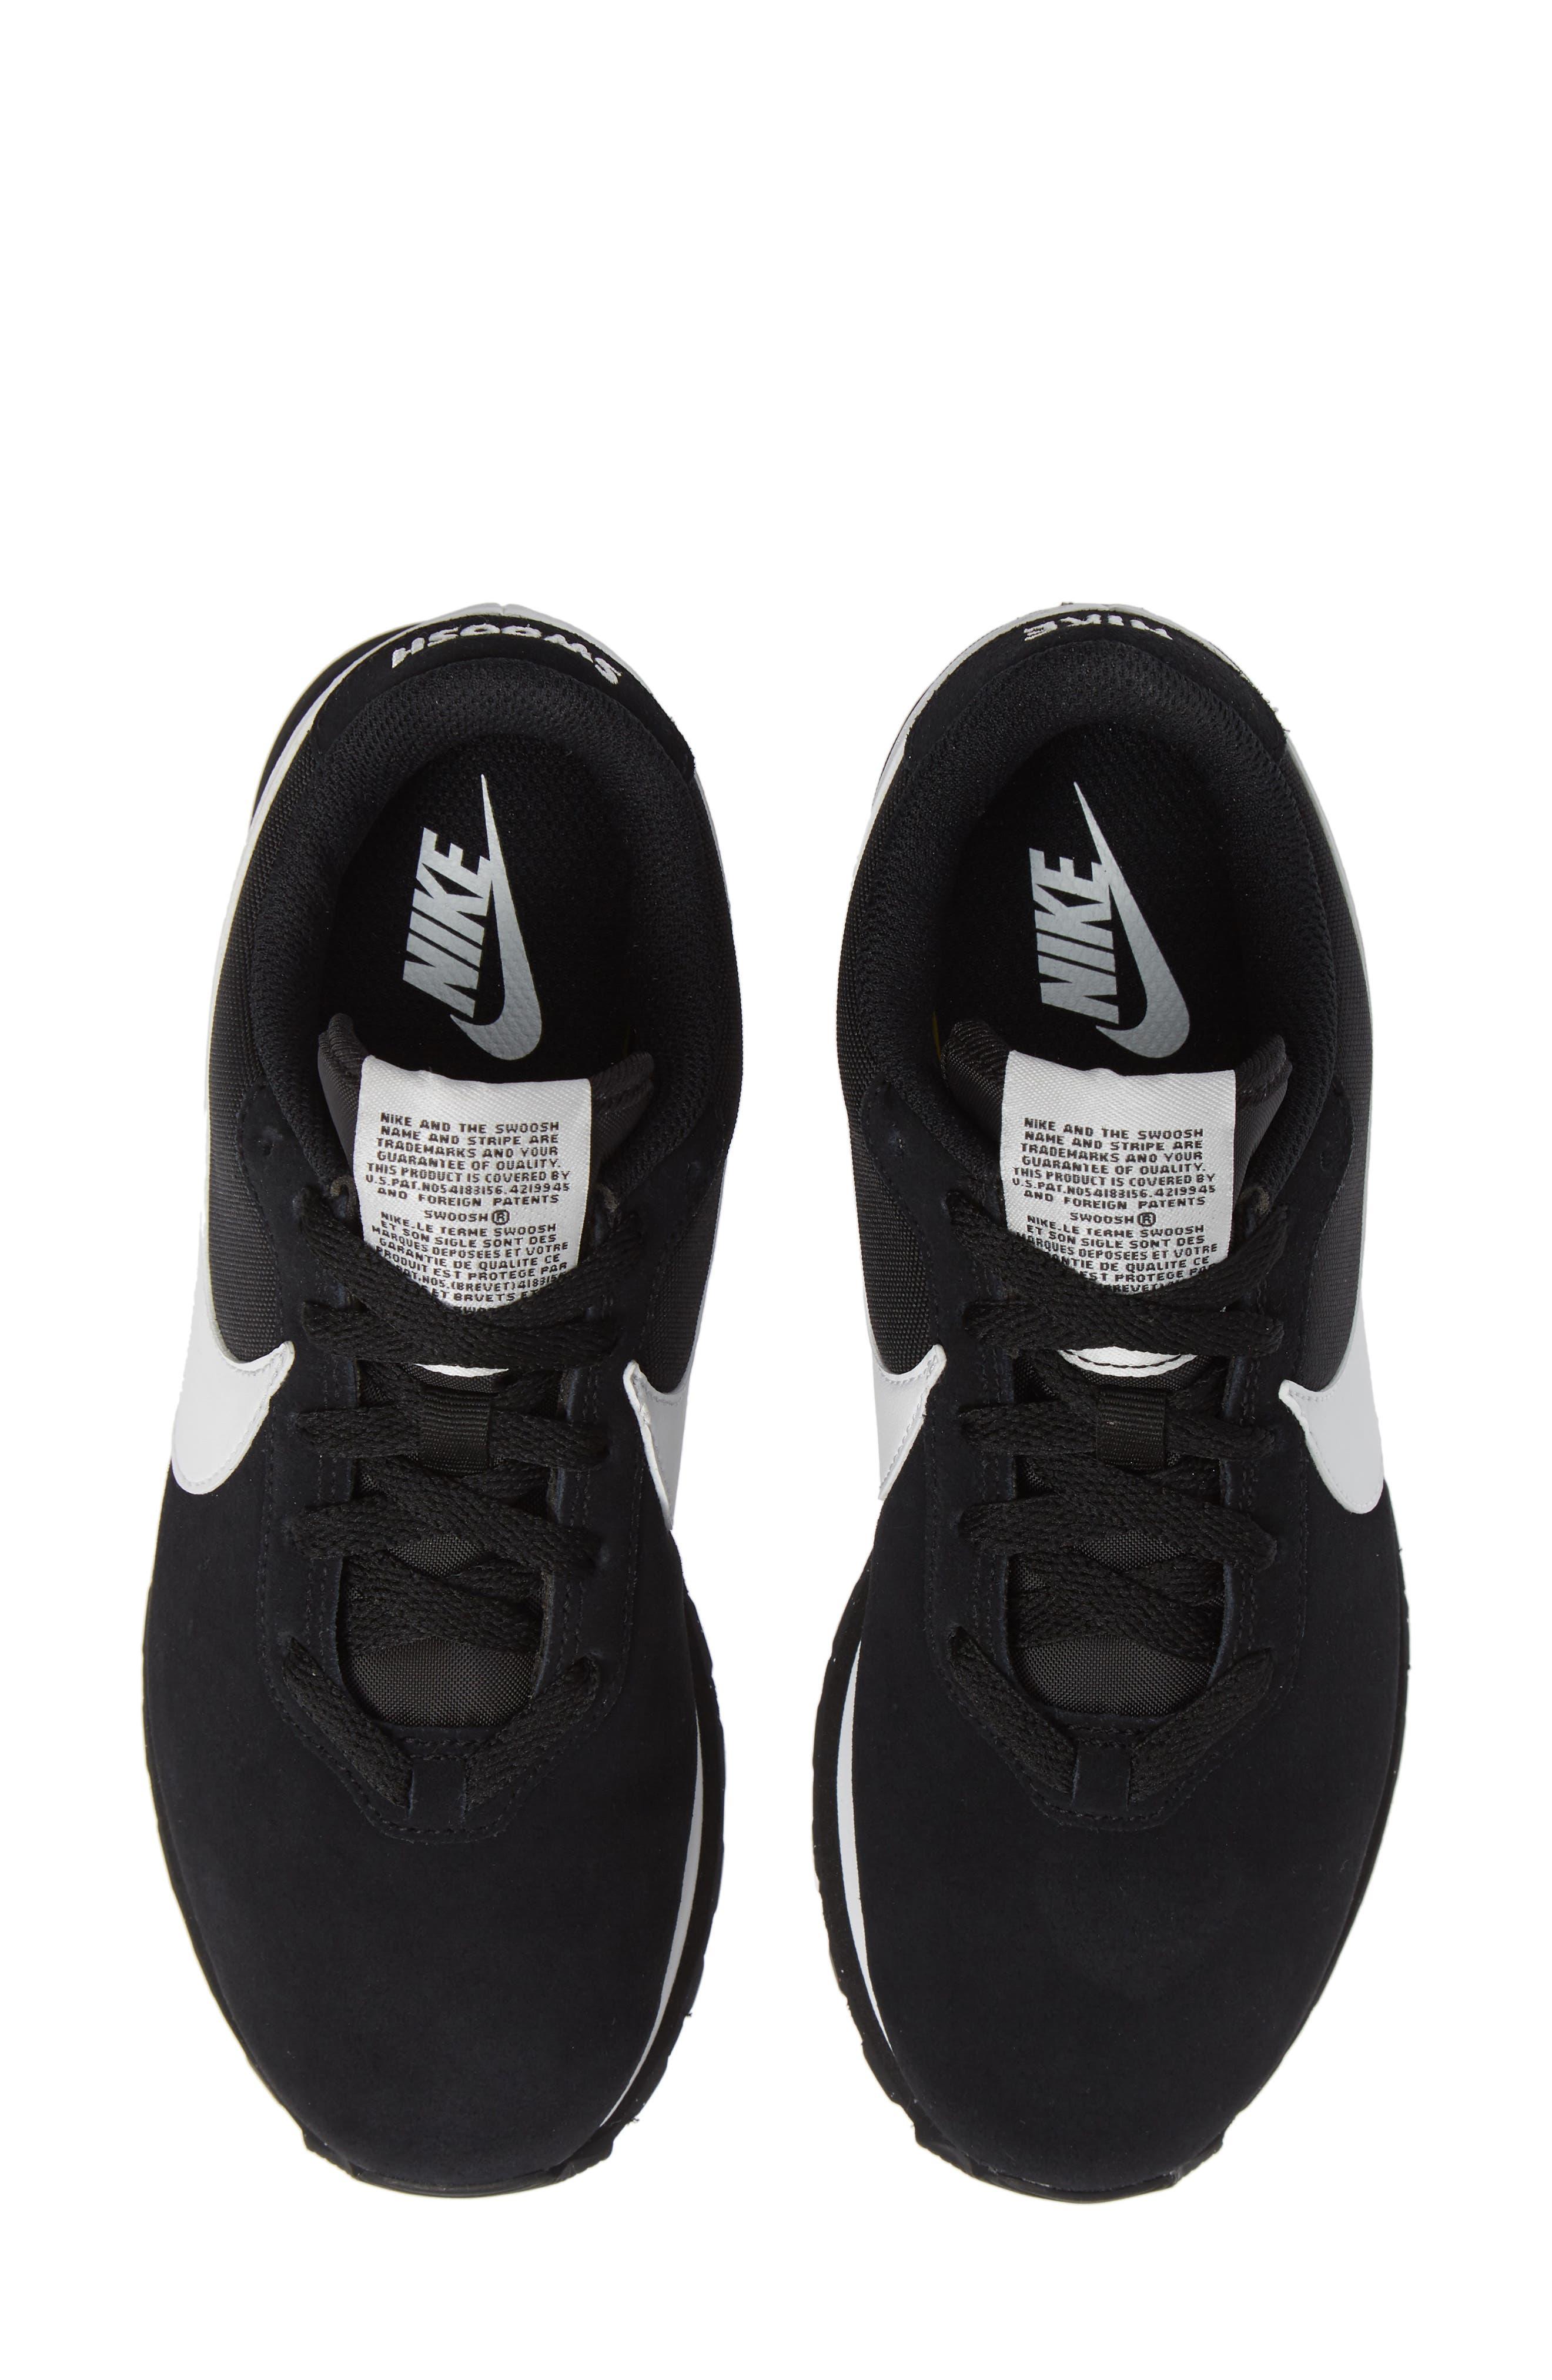 NIKE, Pre Love O.X. Sneaker, Main thumbnail 1, color, BLACK/ SUMMIT WHITE